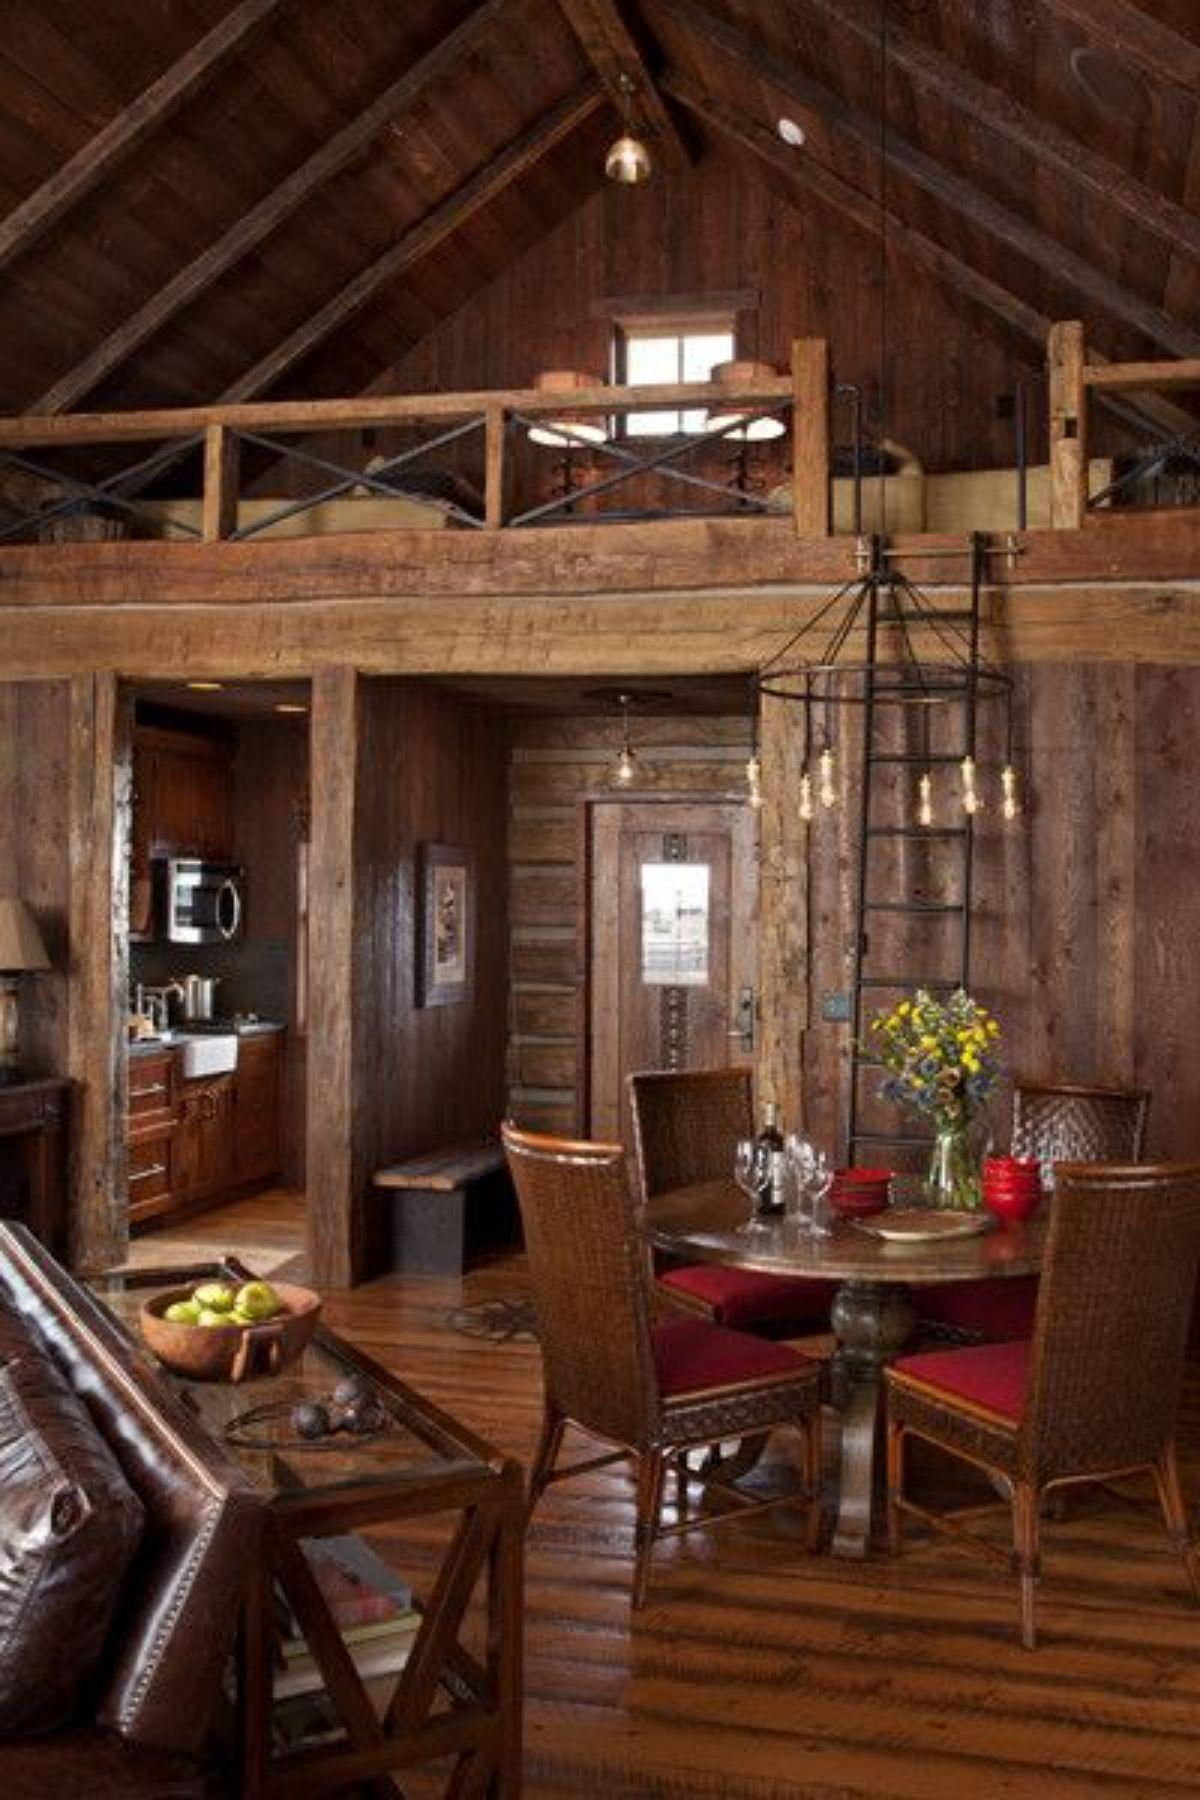 Log room with metal ladder